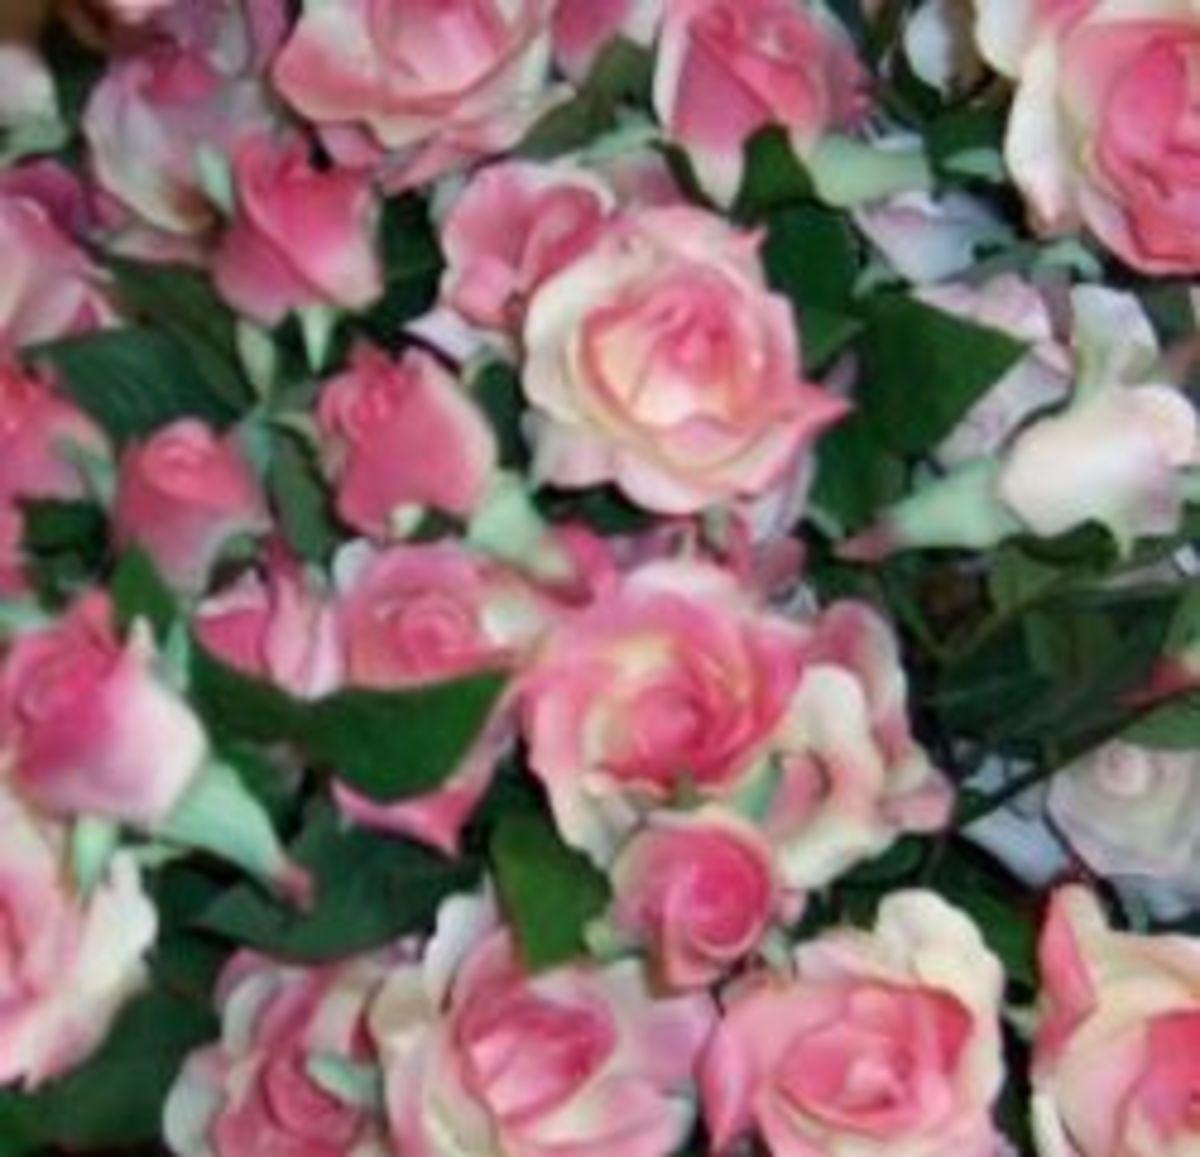 Vivid pink artificial roses